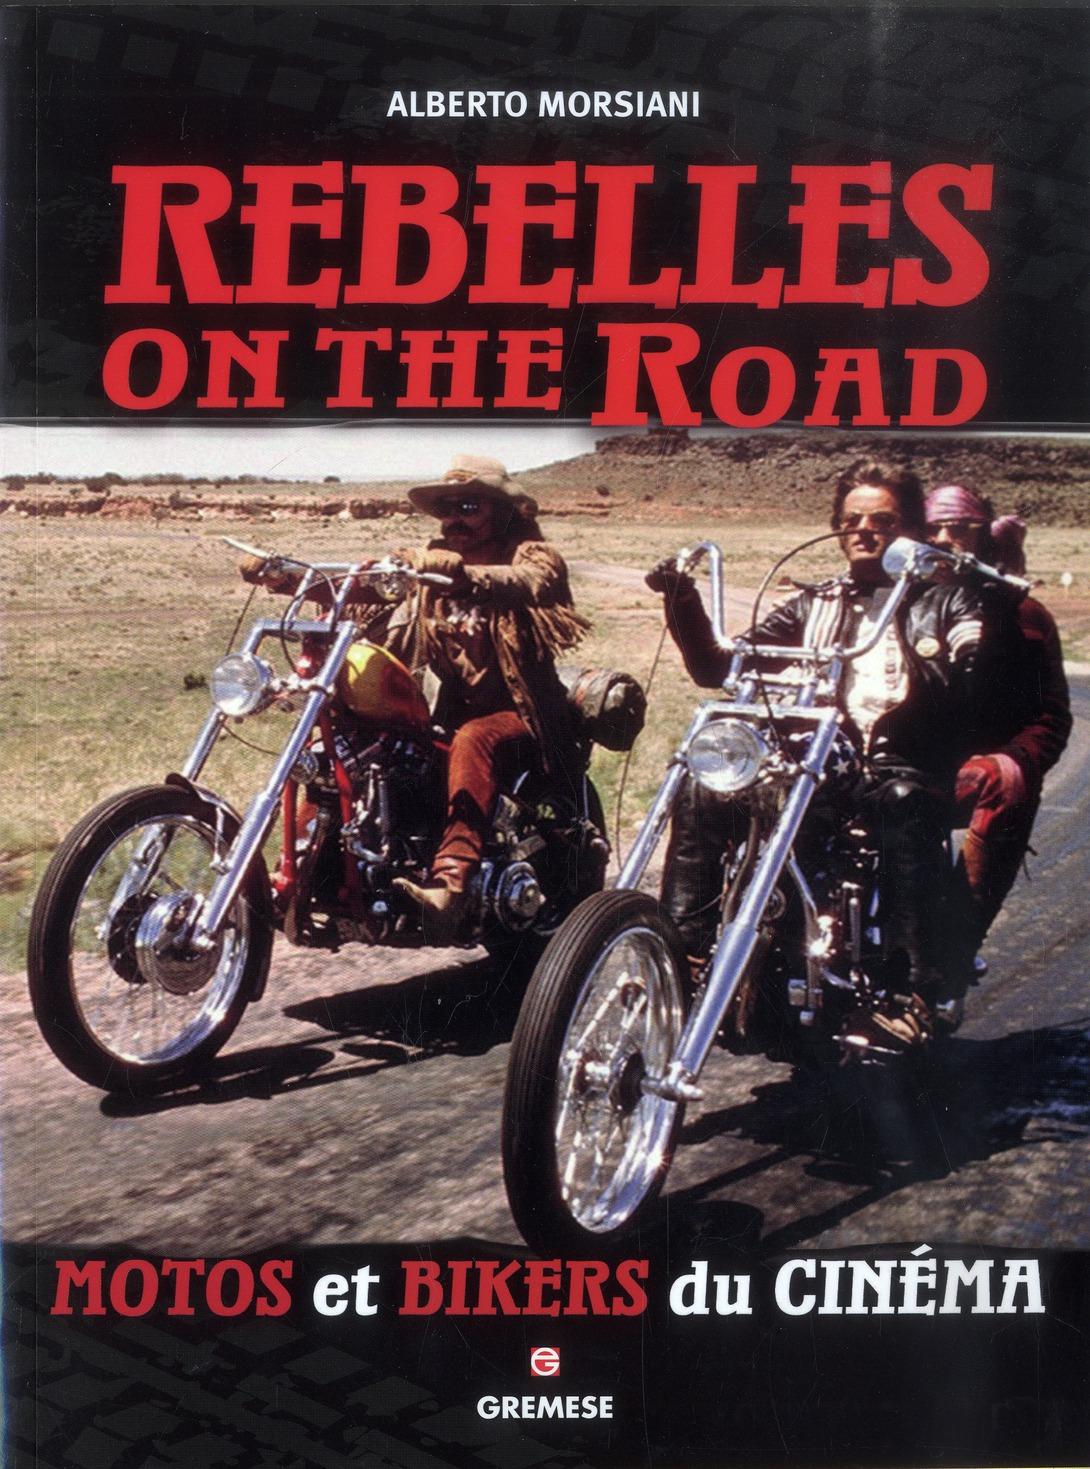 REBELLES ON THE ROAD - MOTOS ET BIKERS DU CINEMA.